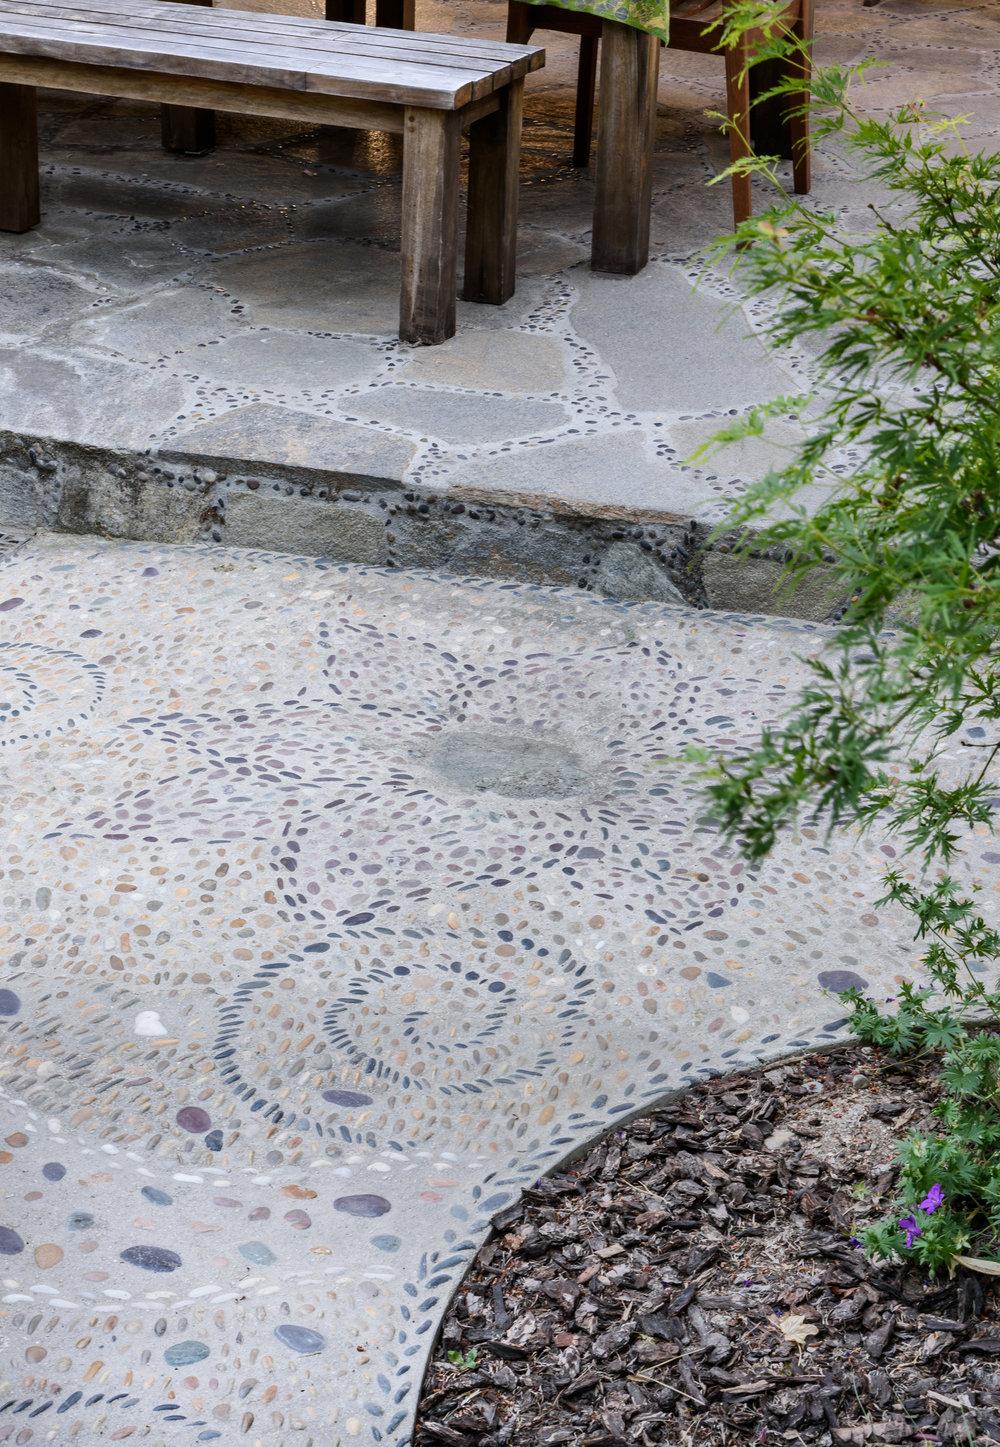 Lotus pebble pathway detail of this Claremont Asian-inspired woodland backyard